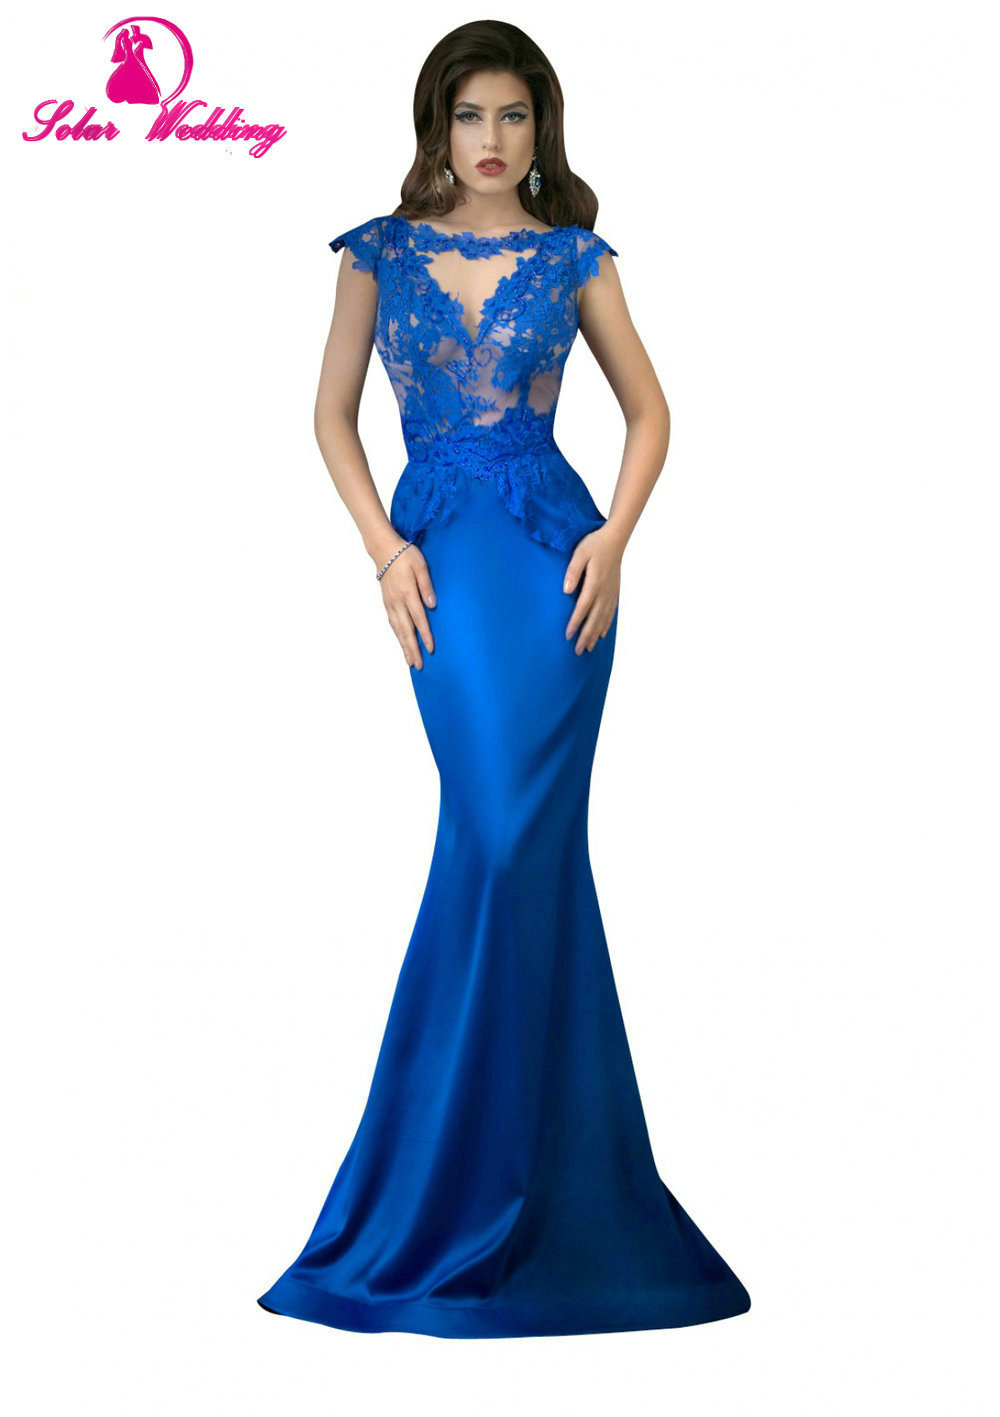 Aliexpress.com : Buy Hot Sale Custom Made 2015 Royal Blue ...